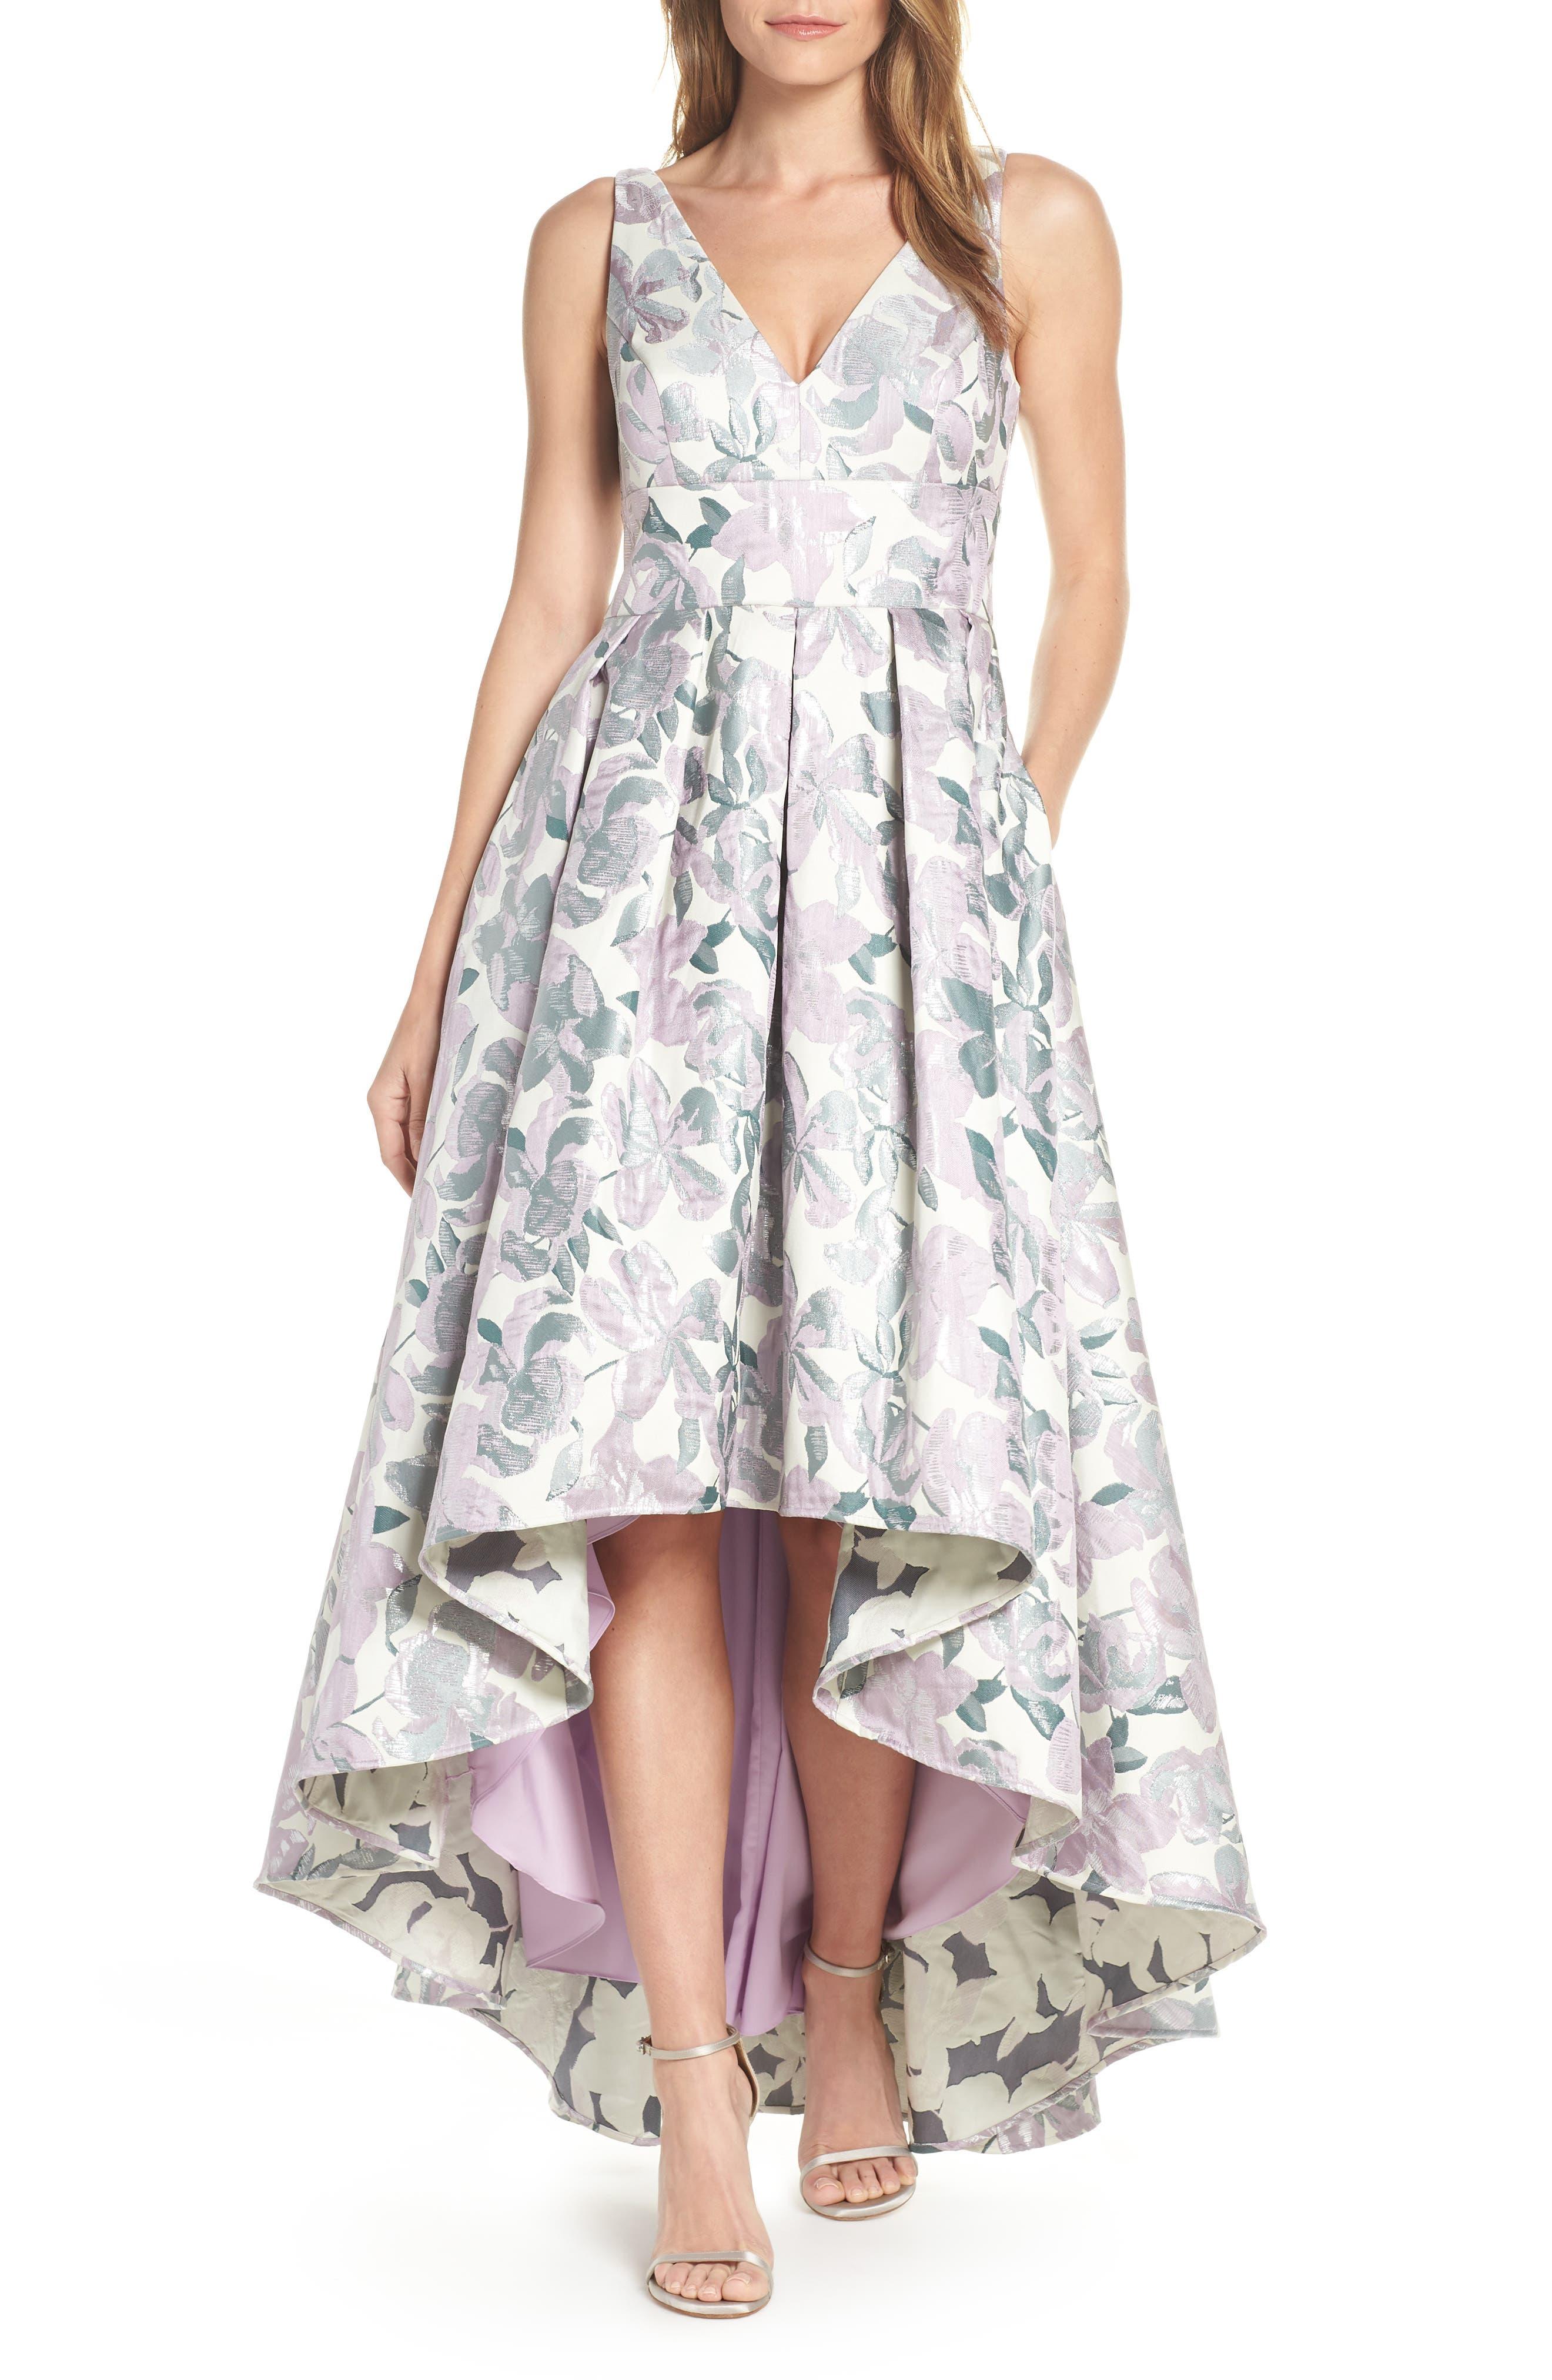 Floral Jacquard High/Low Evening Dress,                             Main thumbnail 1, color,                             LILAC COMBINATION